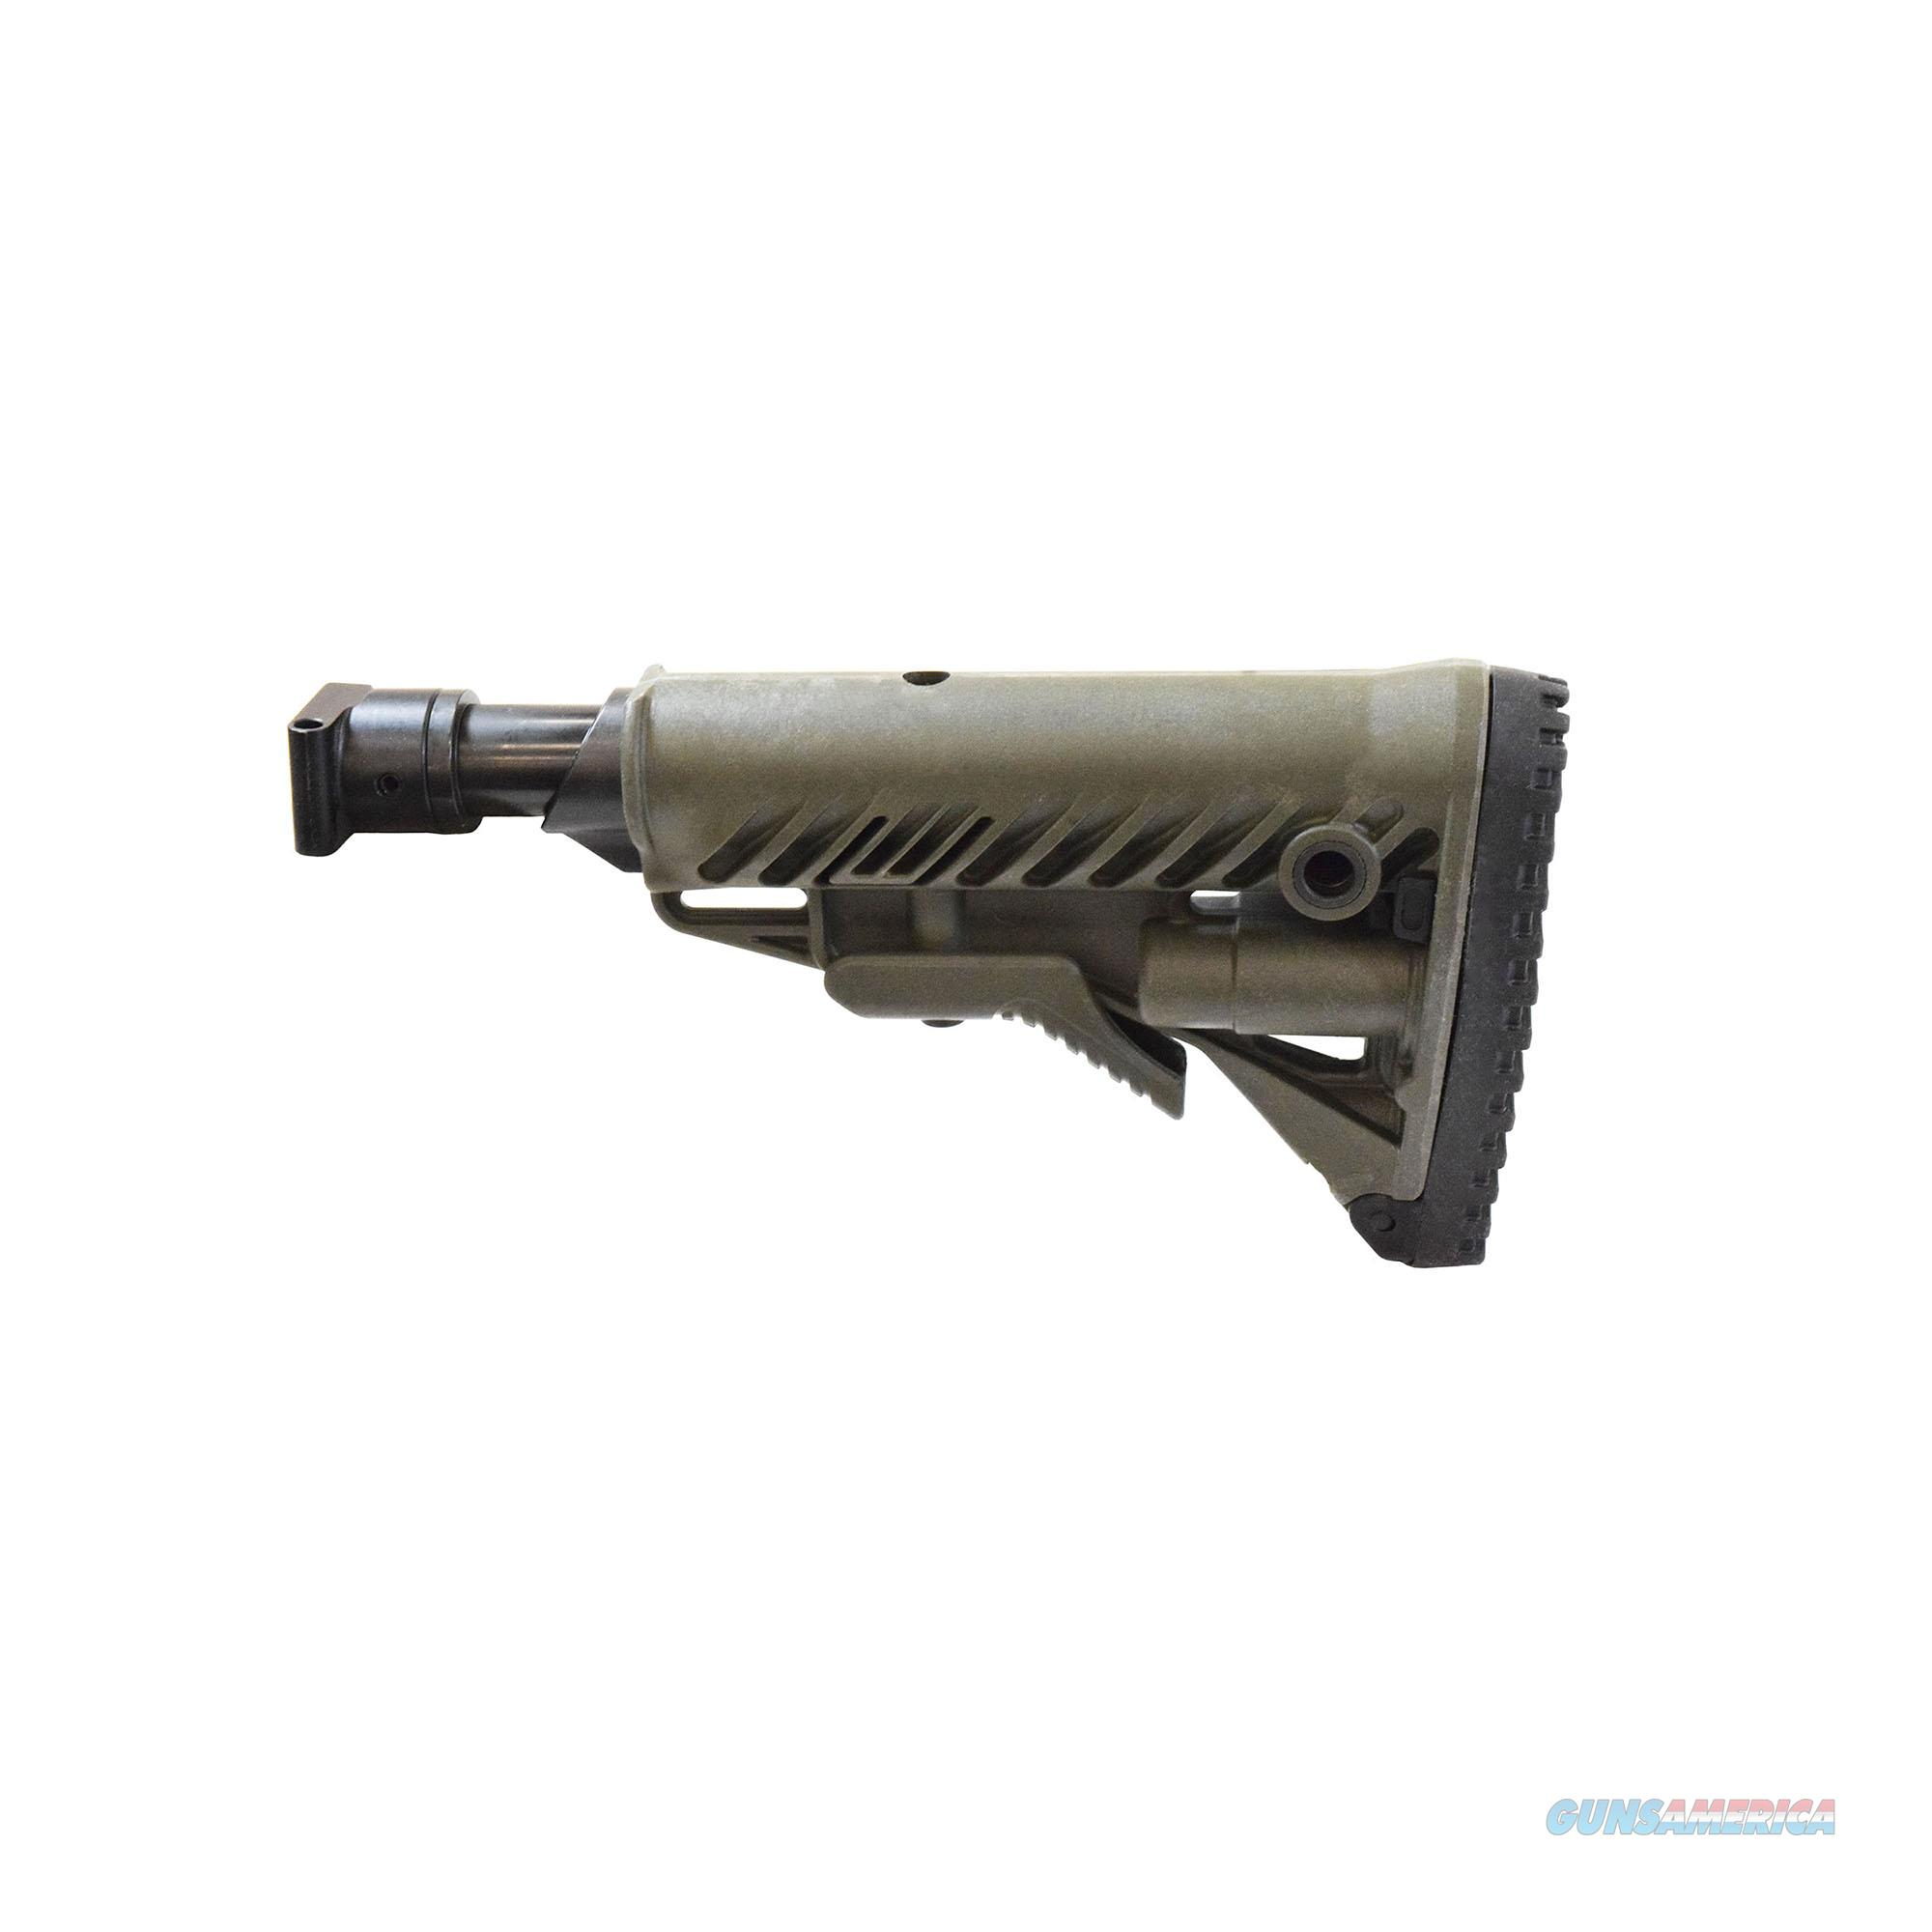 Mako Group Recoil Compensating Folding Collapsible Buttstock System M4-SAIGA SB-OD  Non-Guns > Gunstocks, Grips & Wood